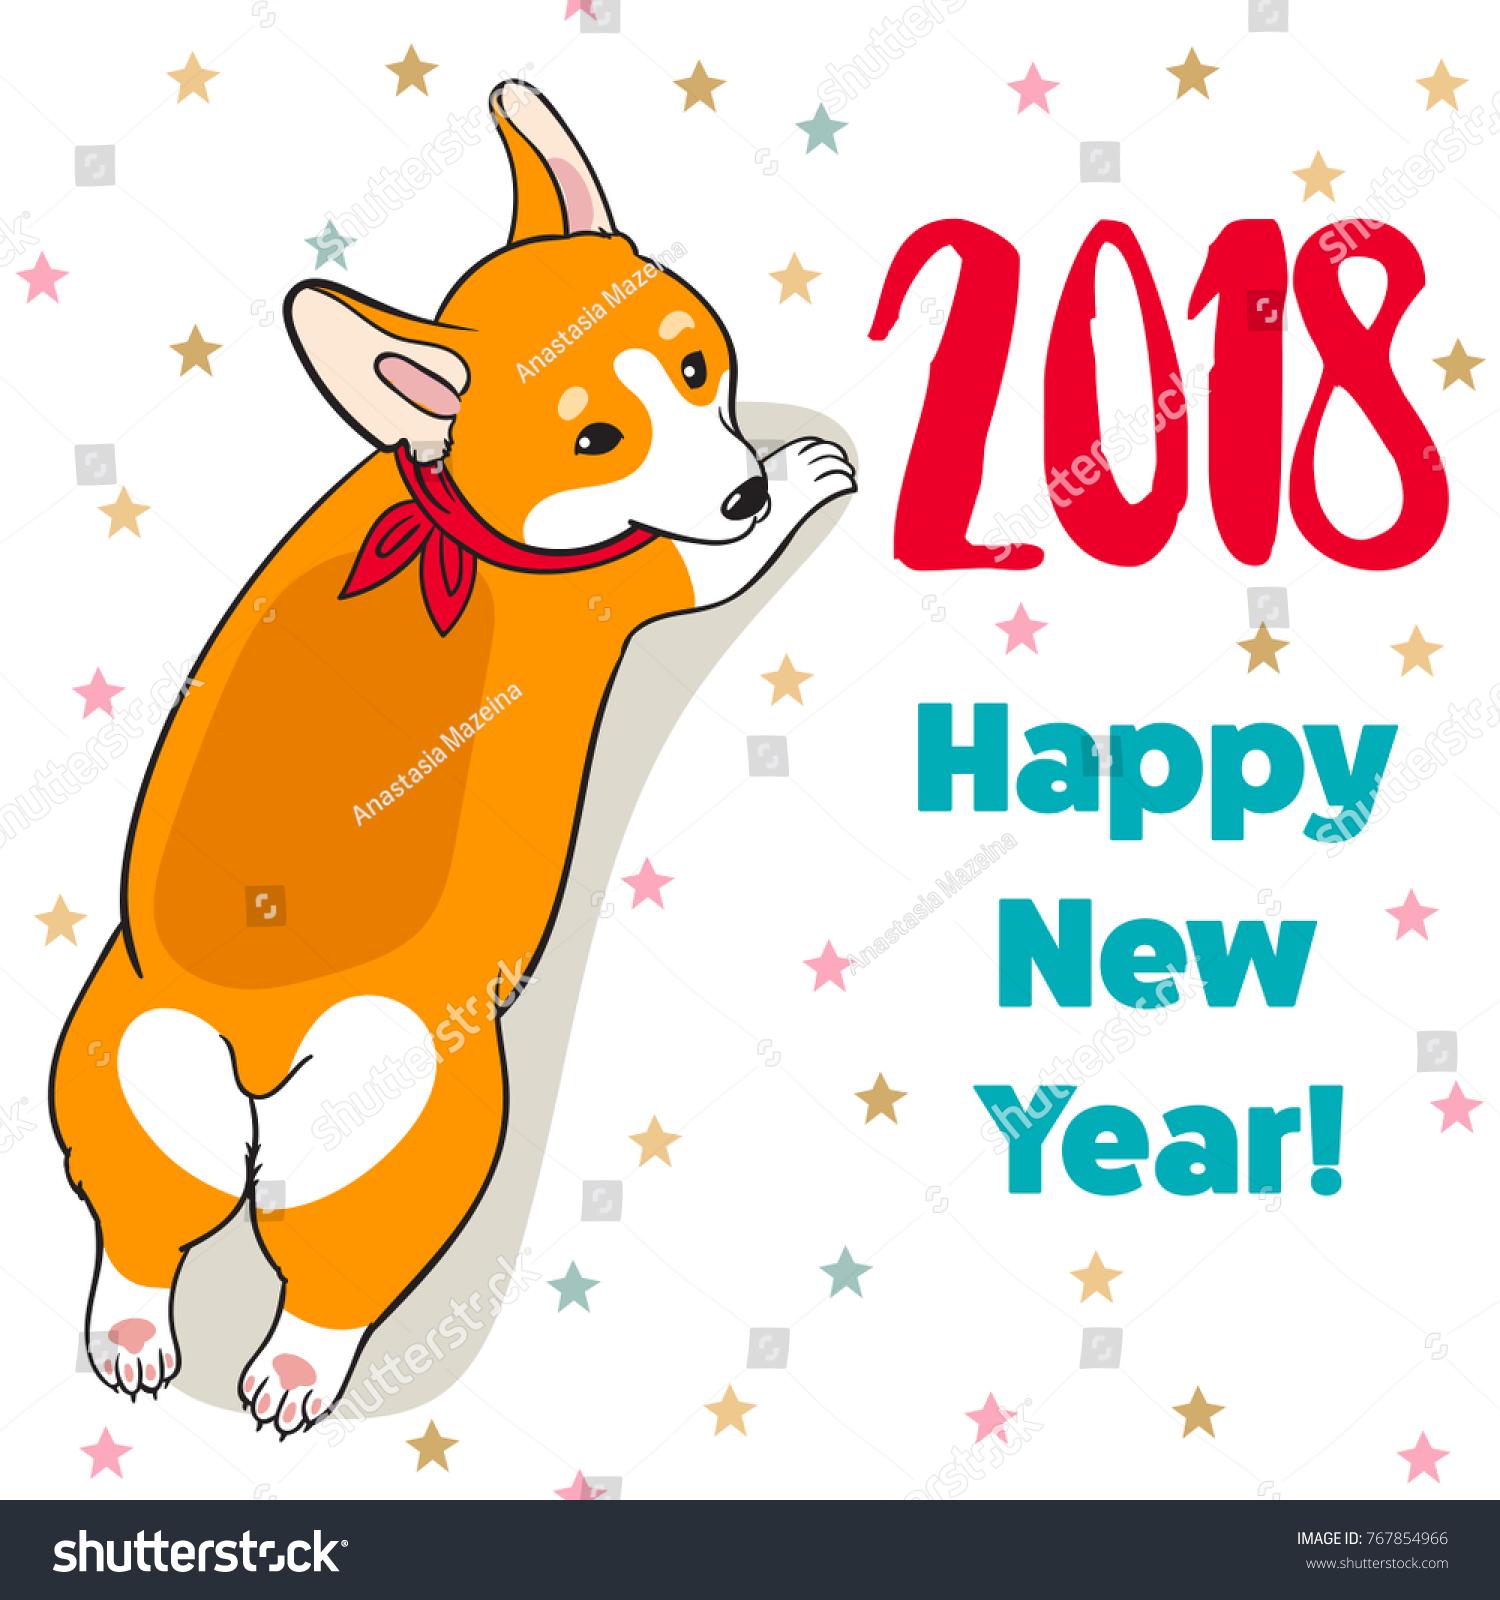 Christmas New Year Greeting Card Cartoon Stock Vector (Royalty Free ...